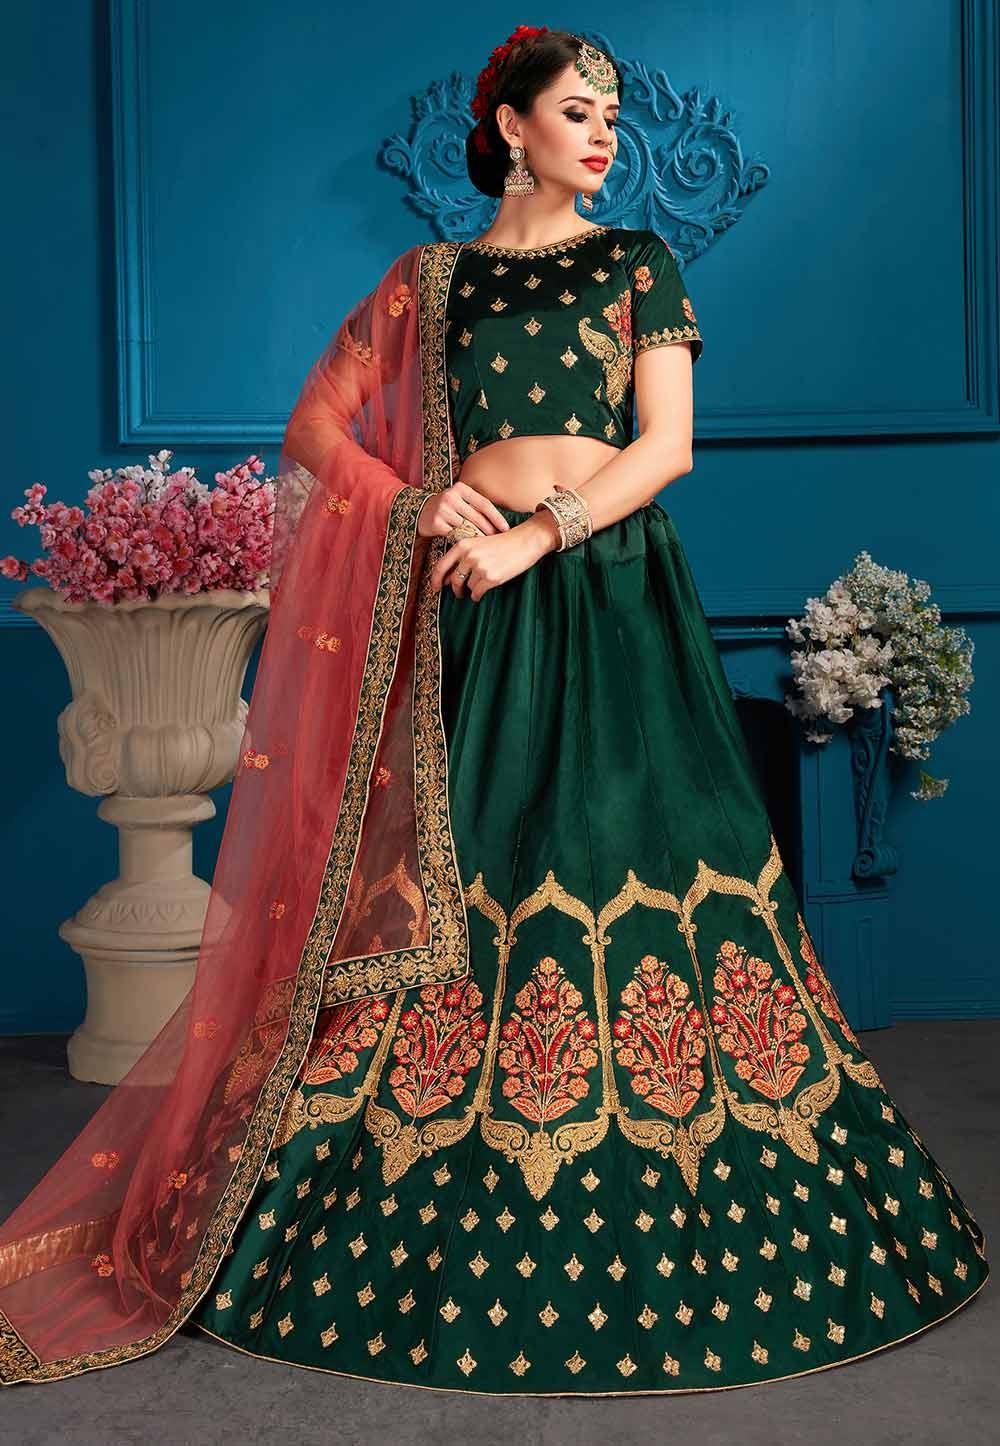 Green Colour Lehenga choli for bridesmaid